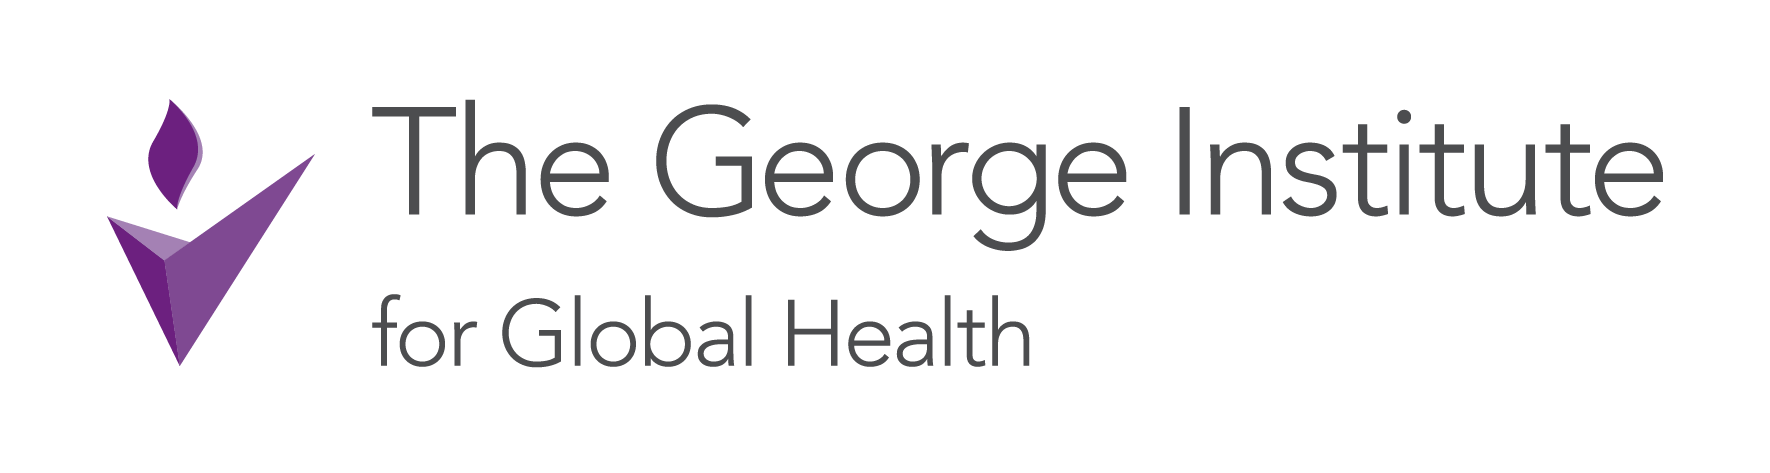 tgi-logo-85k-2612-1770x473